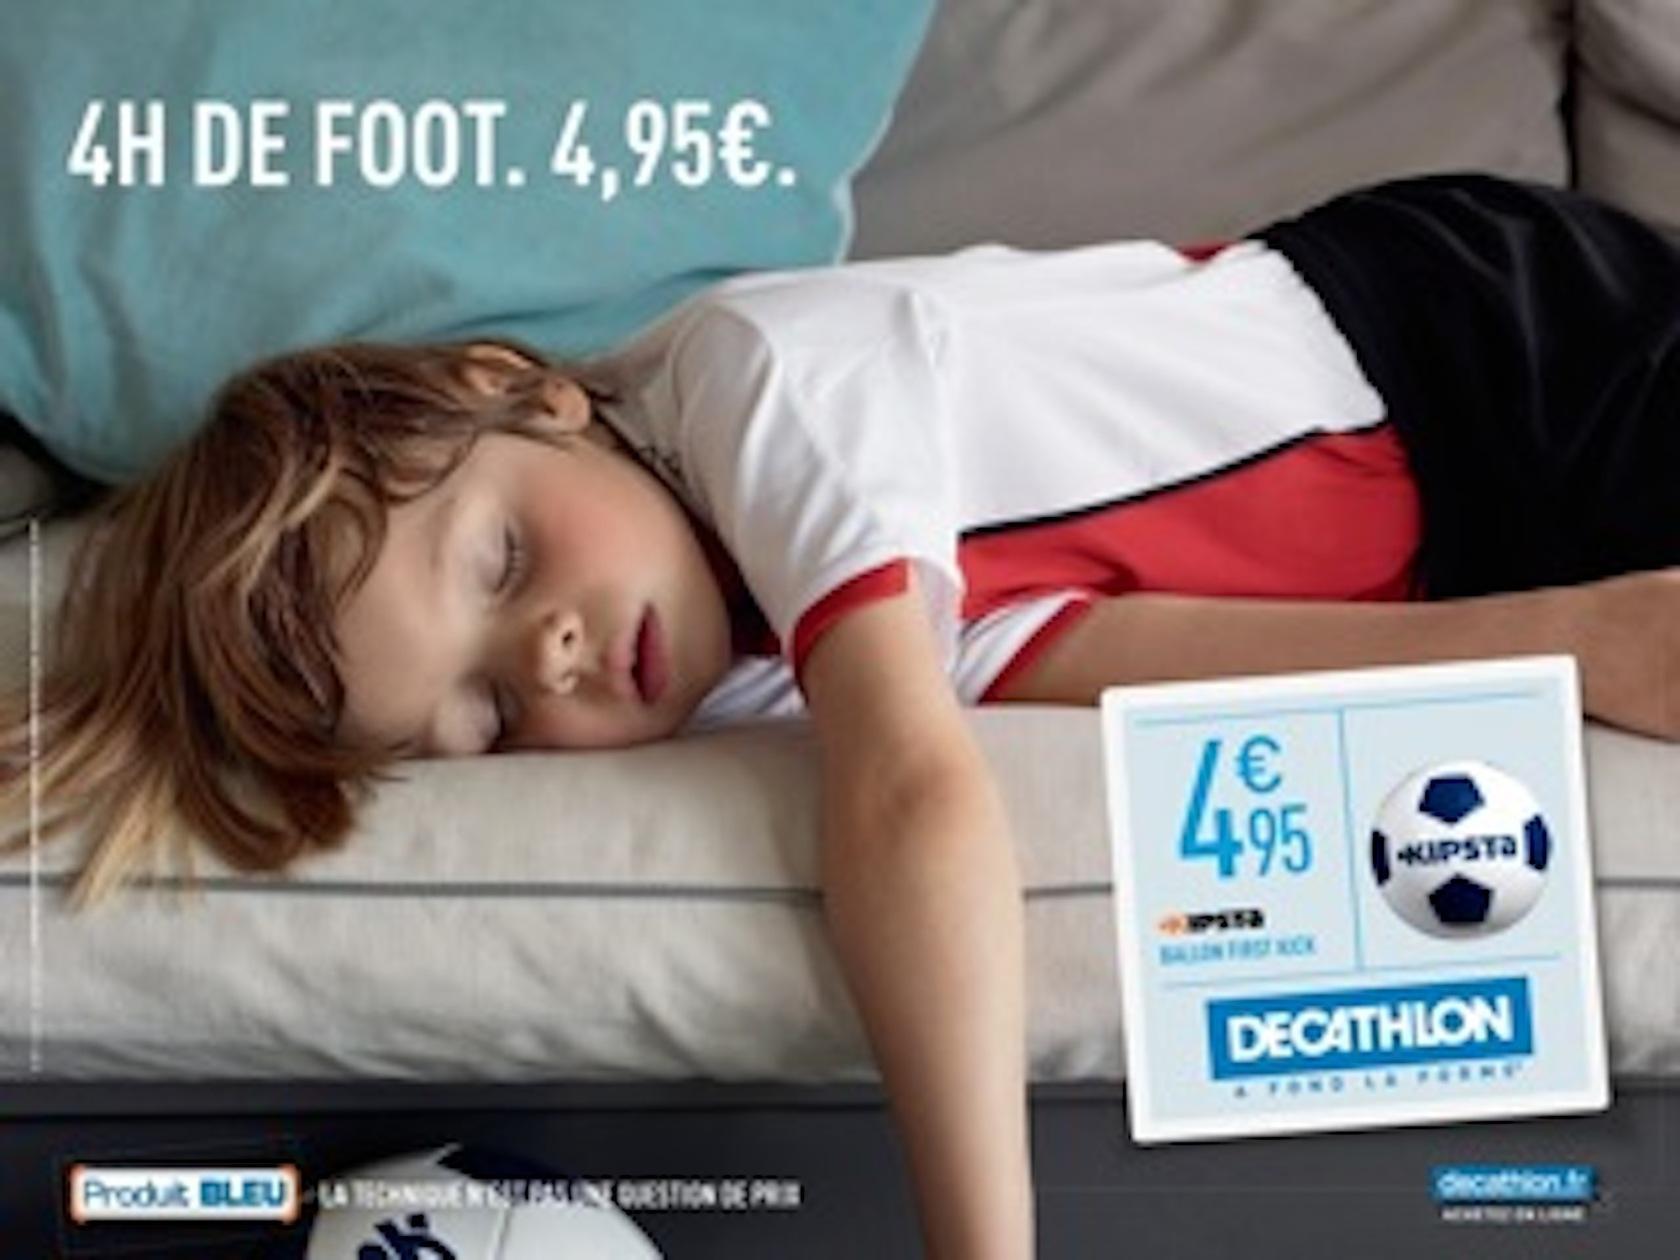 Décathlon Foot Où Ai-Je La Tête ?